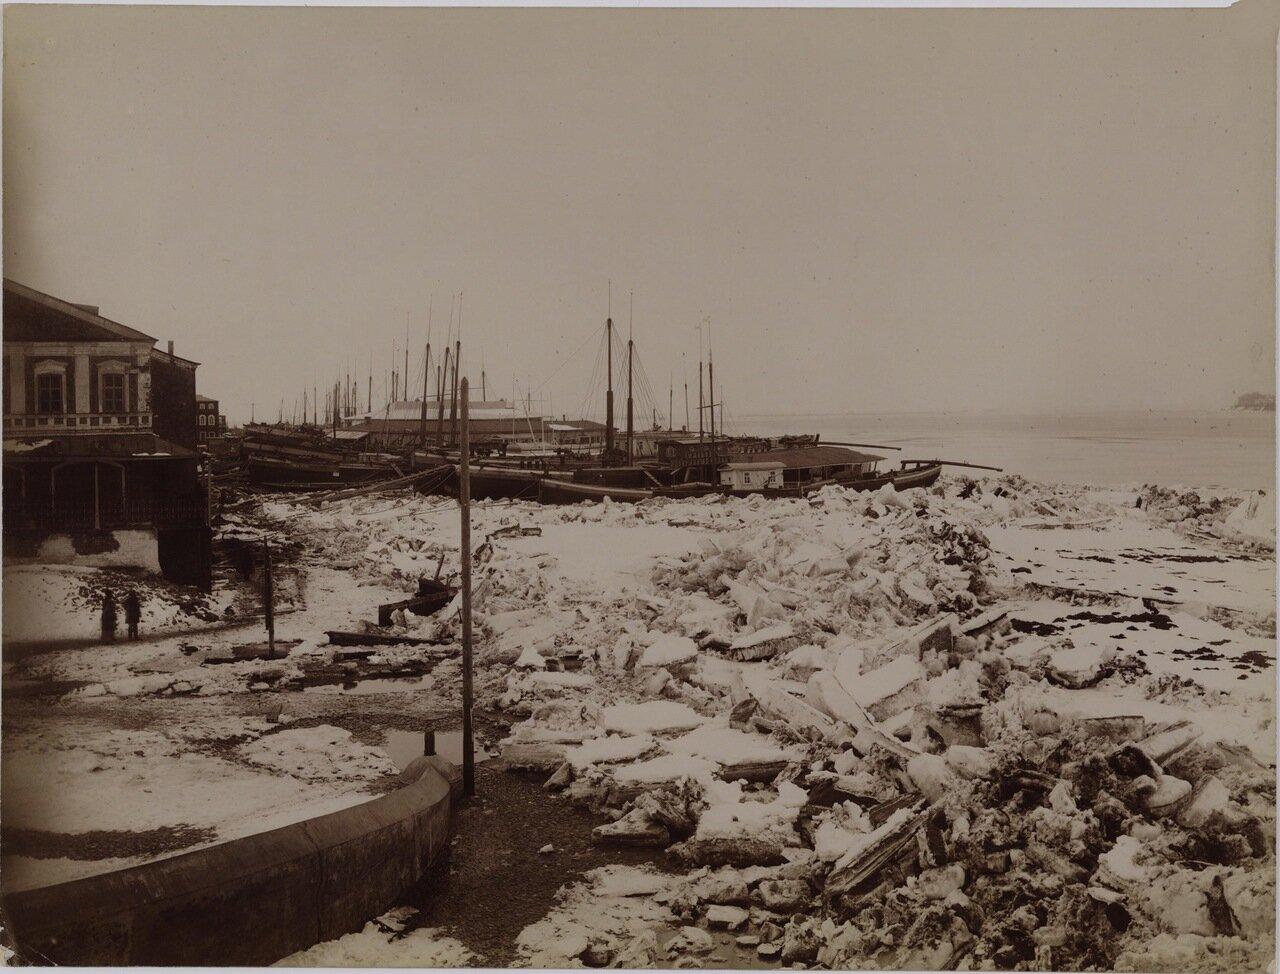 Волжские виды. Ледоход. Крушение каравана на Сибирской пристани в Нижнем Новгороде. 1893